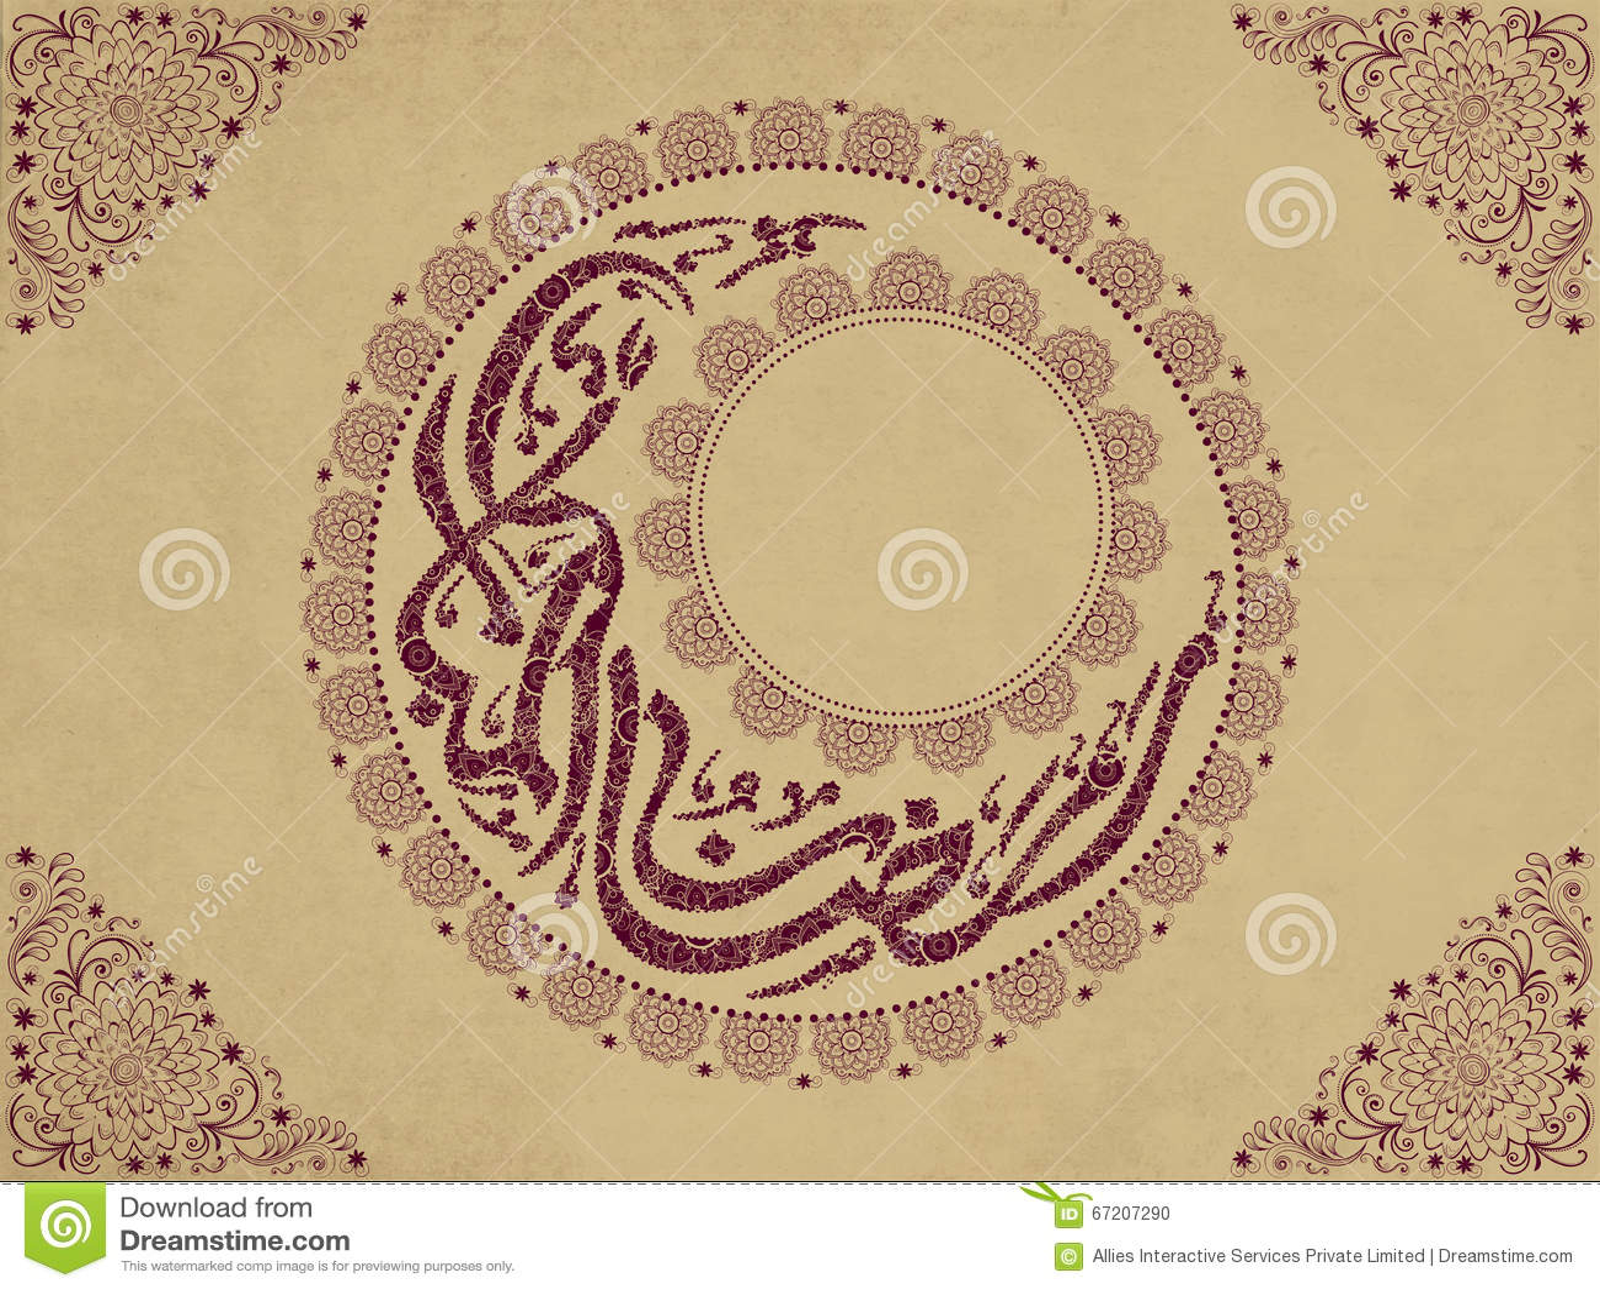 Greeting card for ramadan kareem celebration stock illustration greeting card for ramadan kareem celebration m4hsunfo